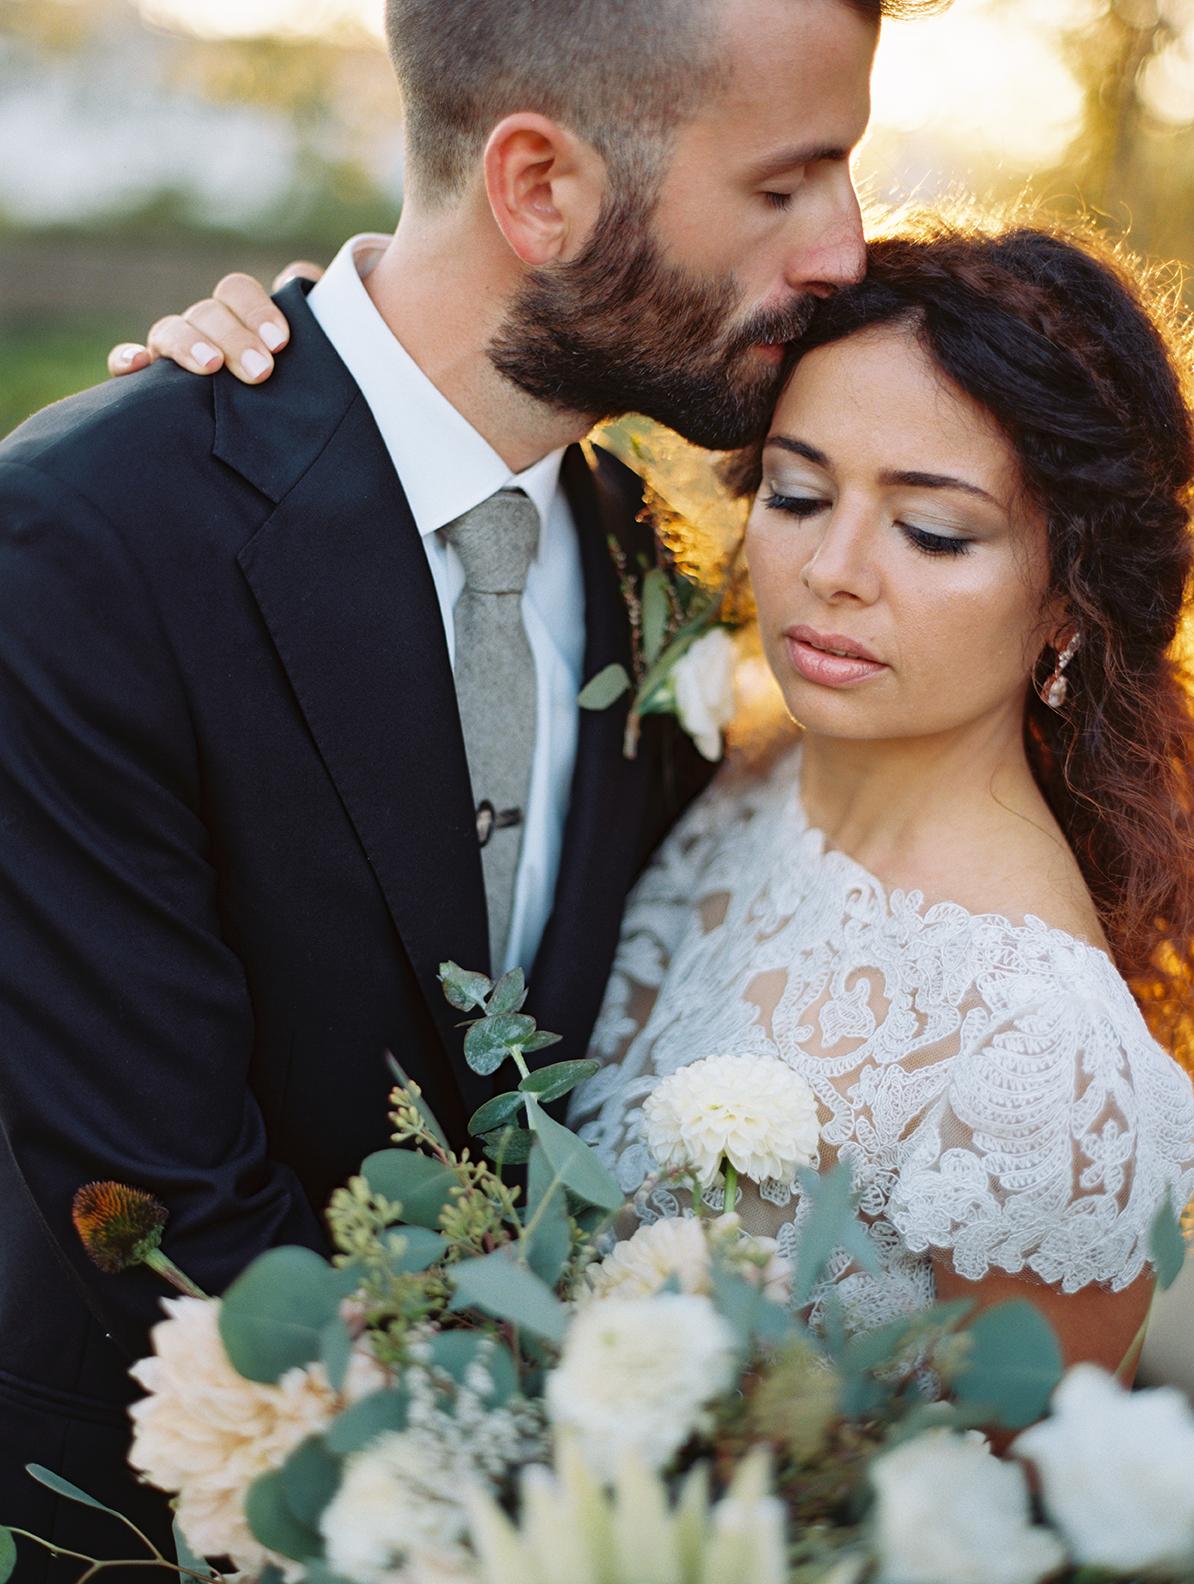 303-brian-sarra-los-angeles-wedding-brumley-wells-photography.jpg